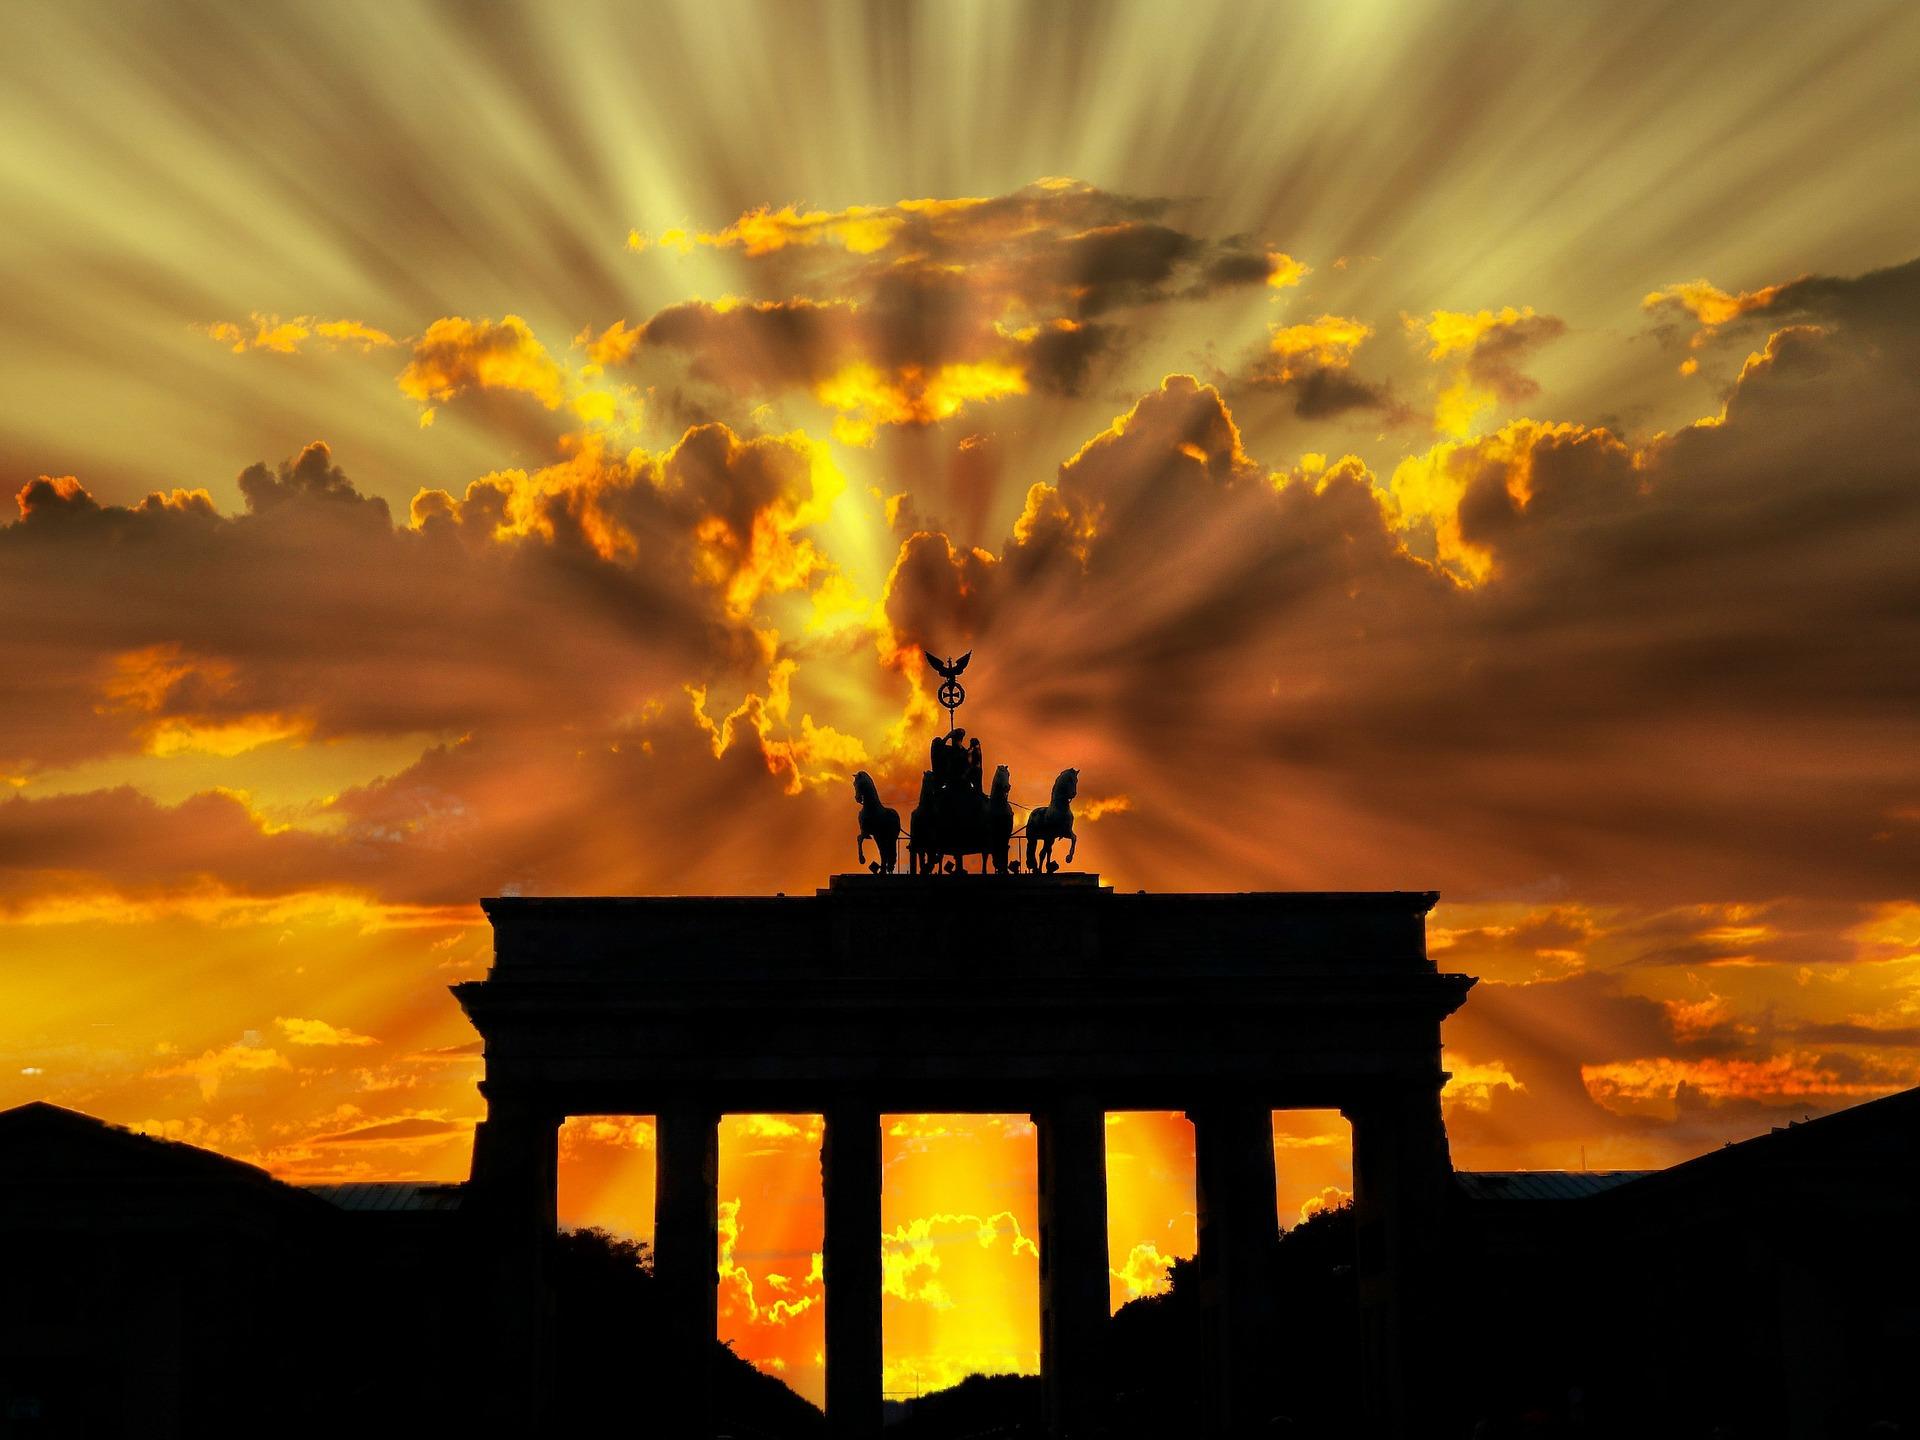 Berlin | DigiNo | 10 Best Locations For Digital Nomads